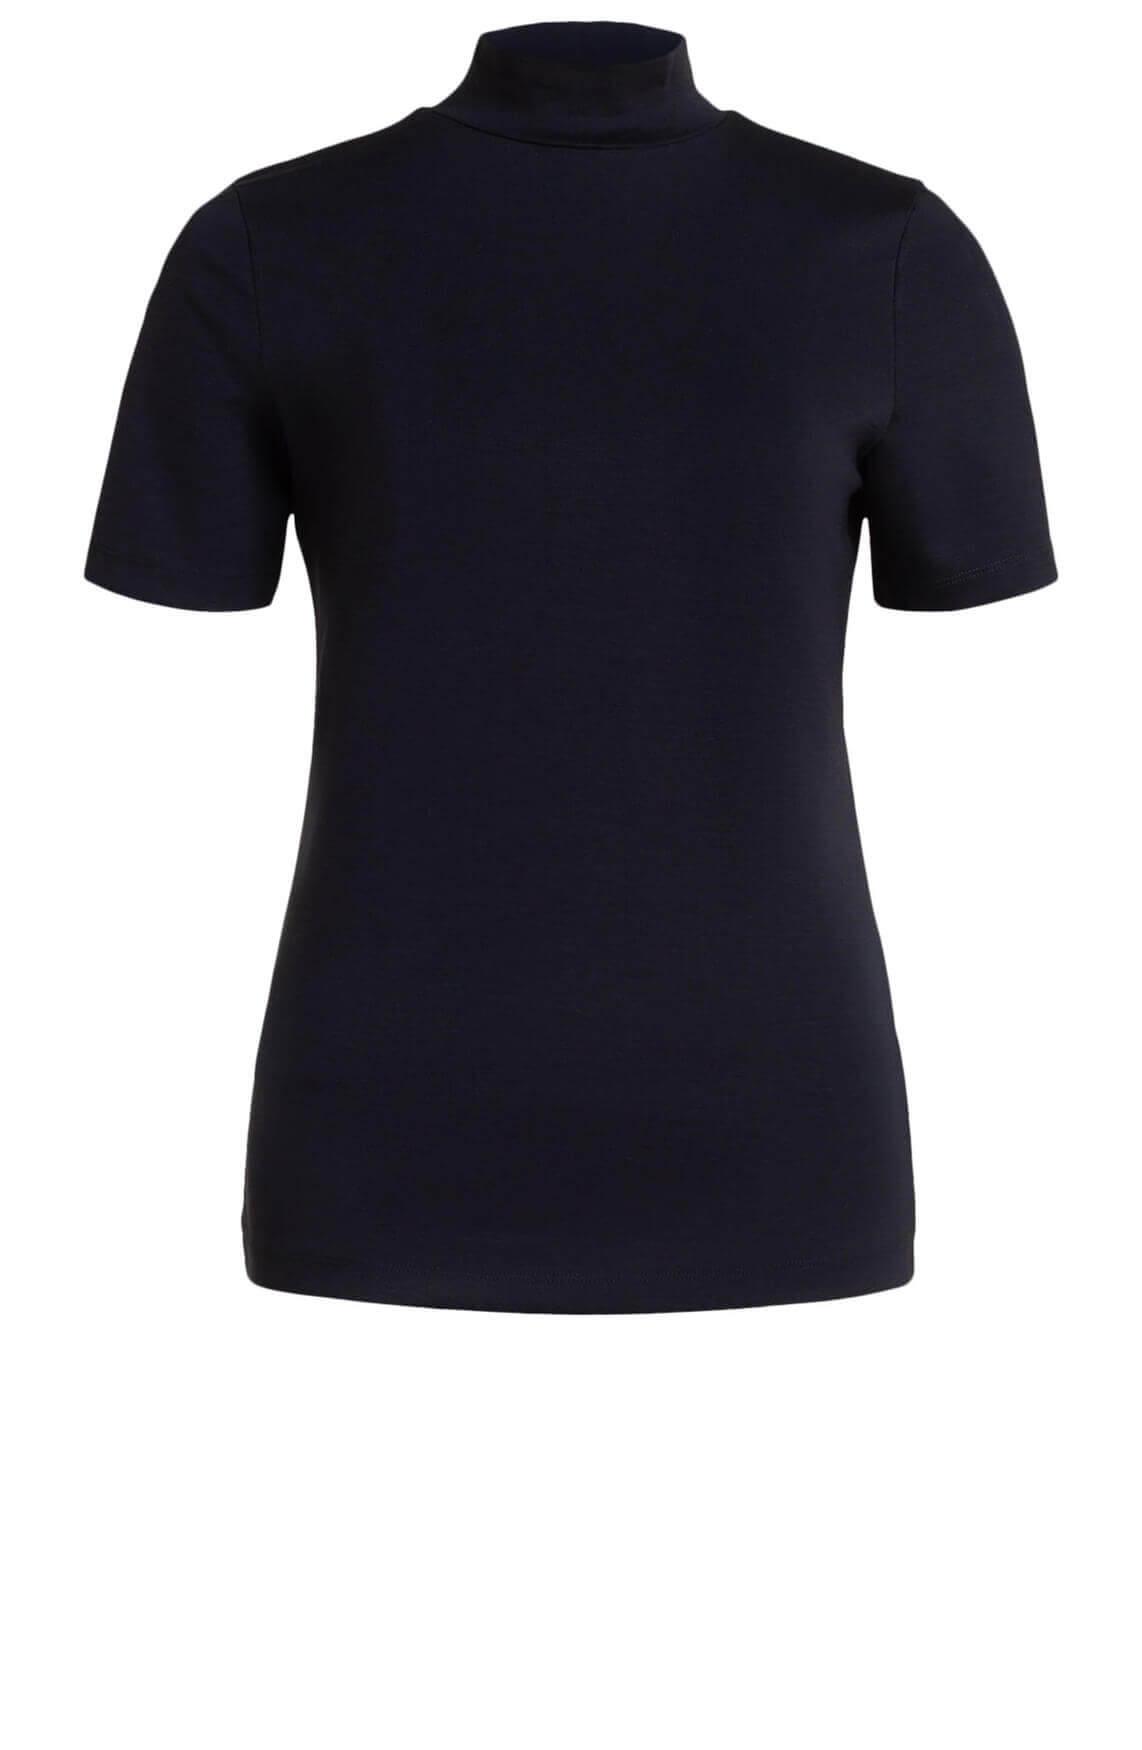 Drykorn Dames Pinana shirt zwart